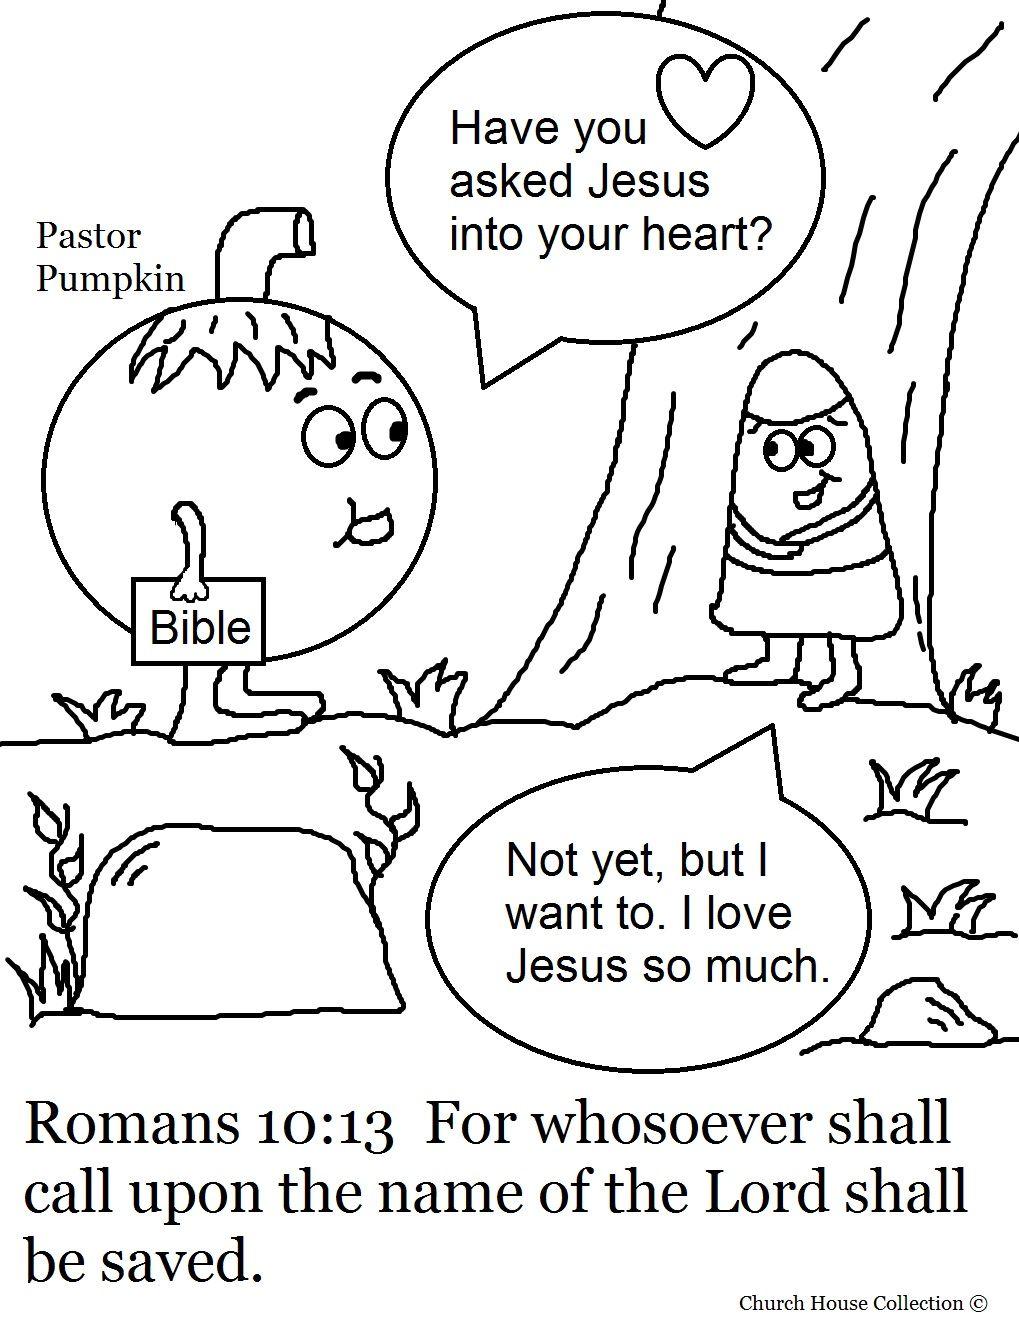 Pumpkin Prayer Coloring Pages at GetDrawings.com | Free ...